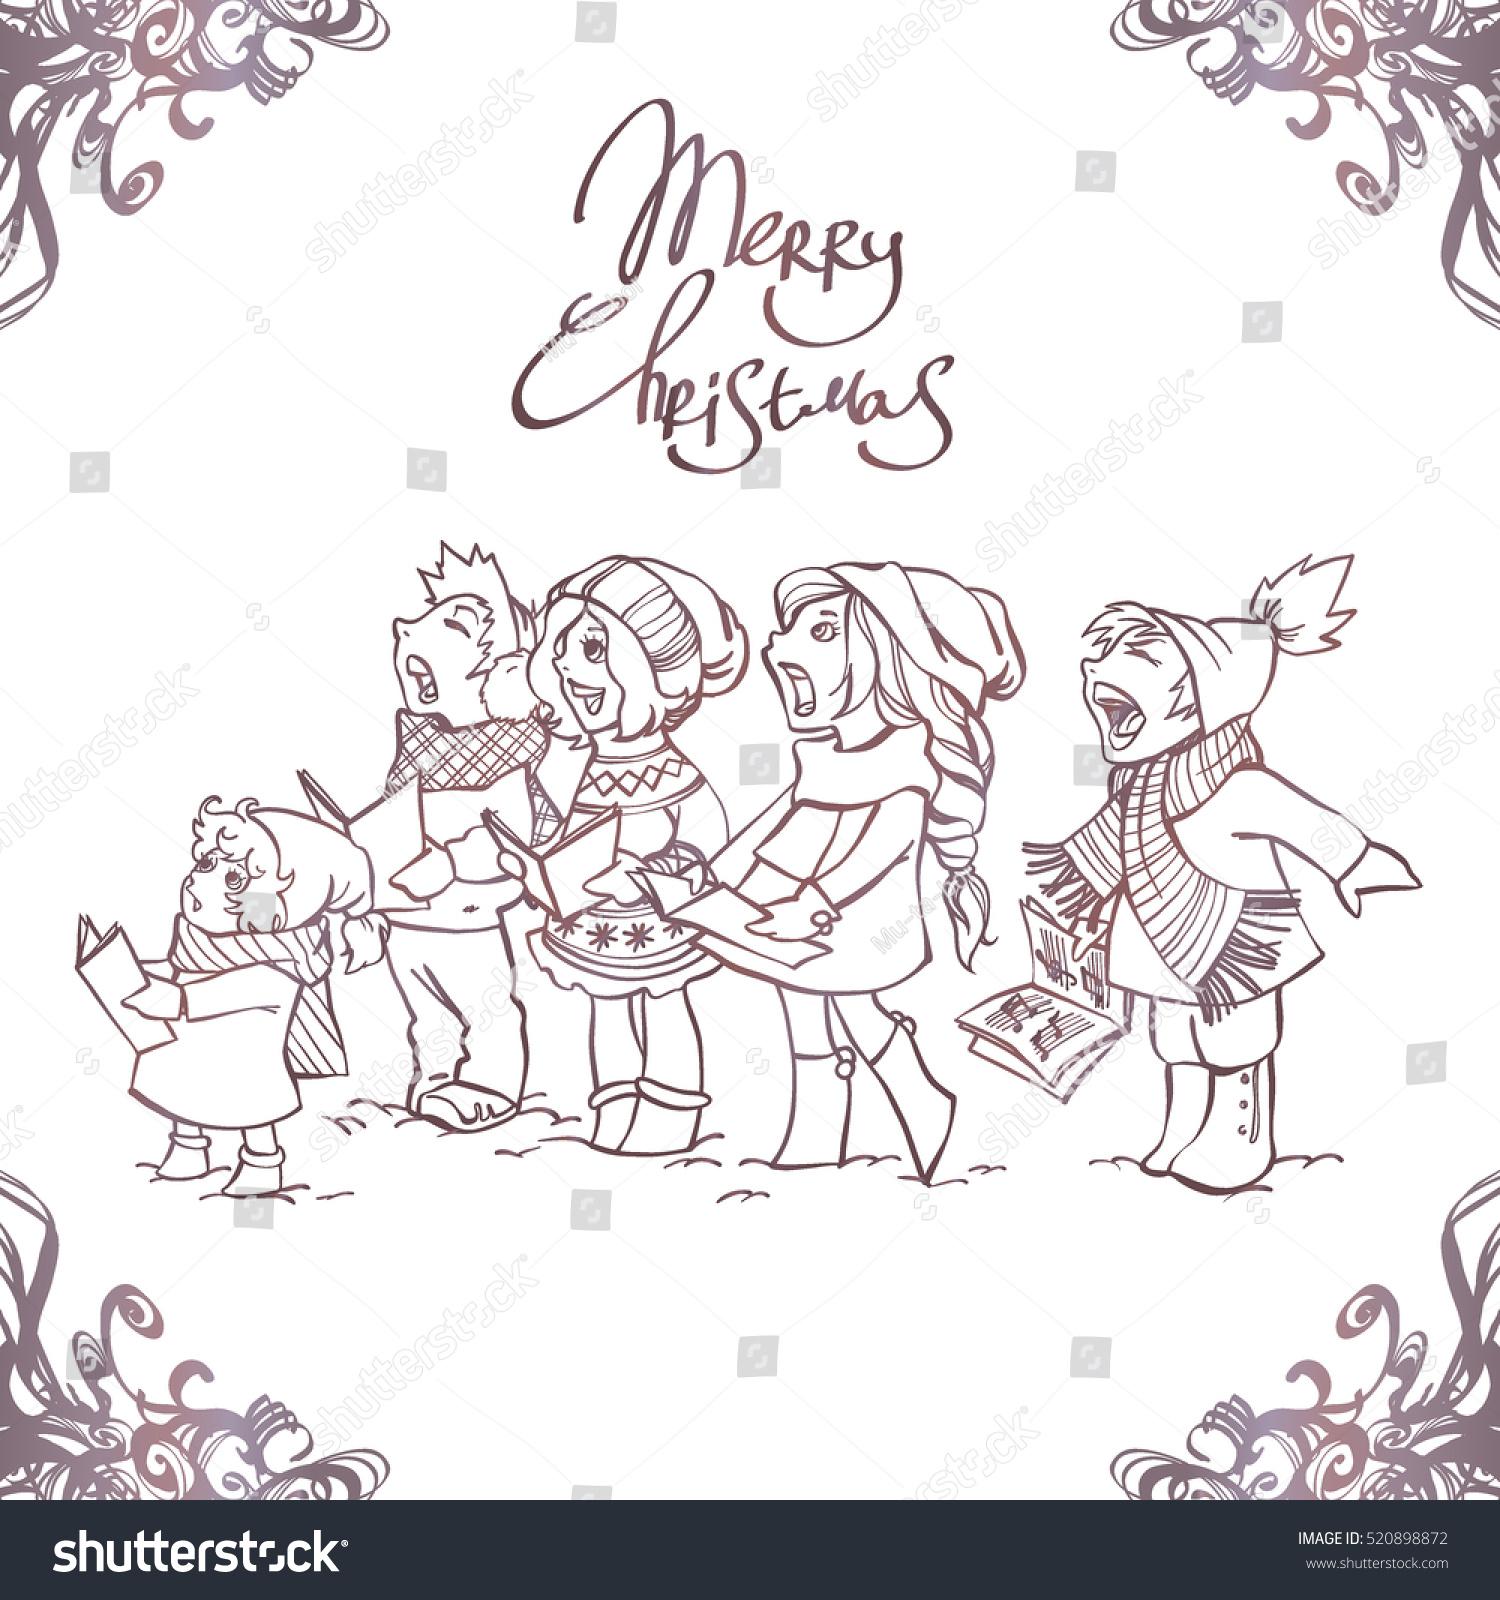 Children Choir Funny Kids Singing Christmas Stock Vector Royalty Free 520898872